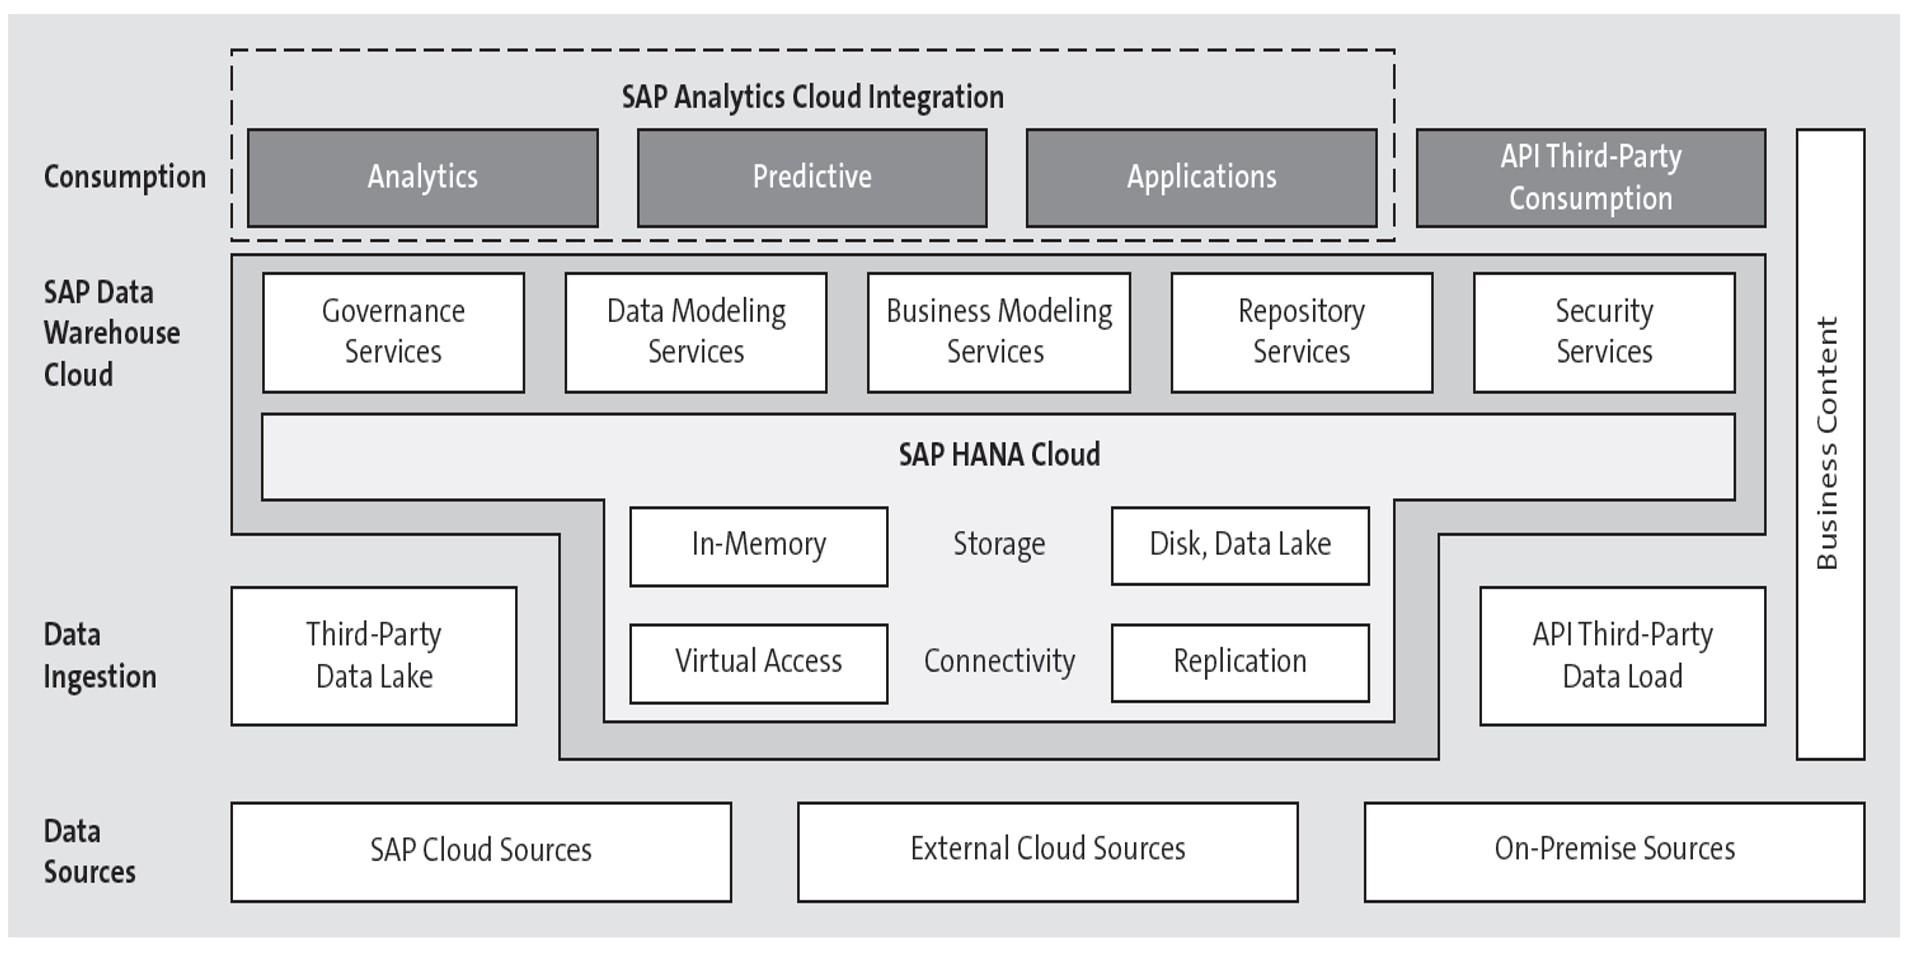 Architecture of SAP Data Warehouse Cloud